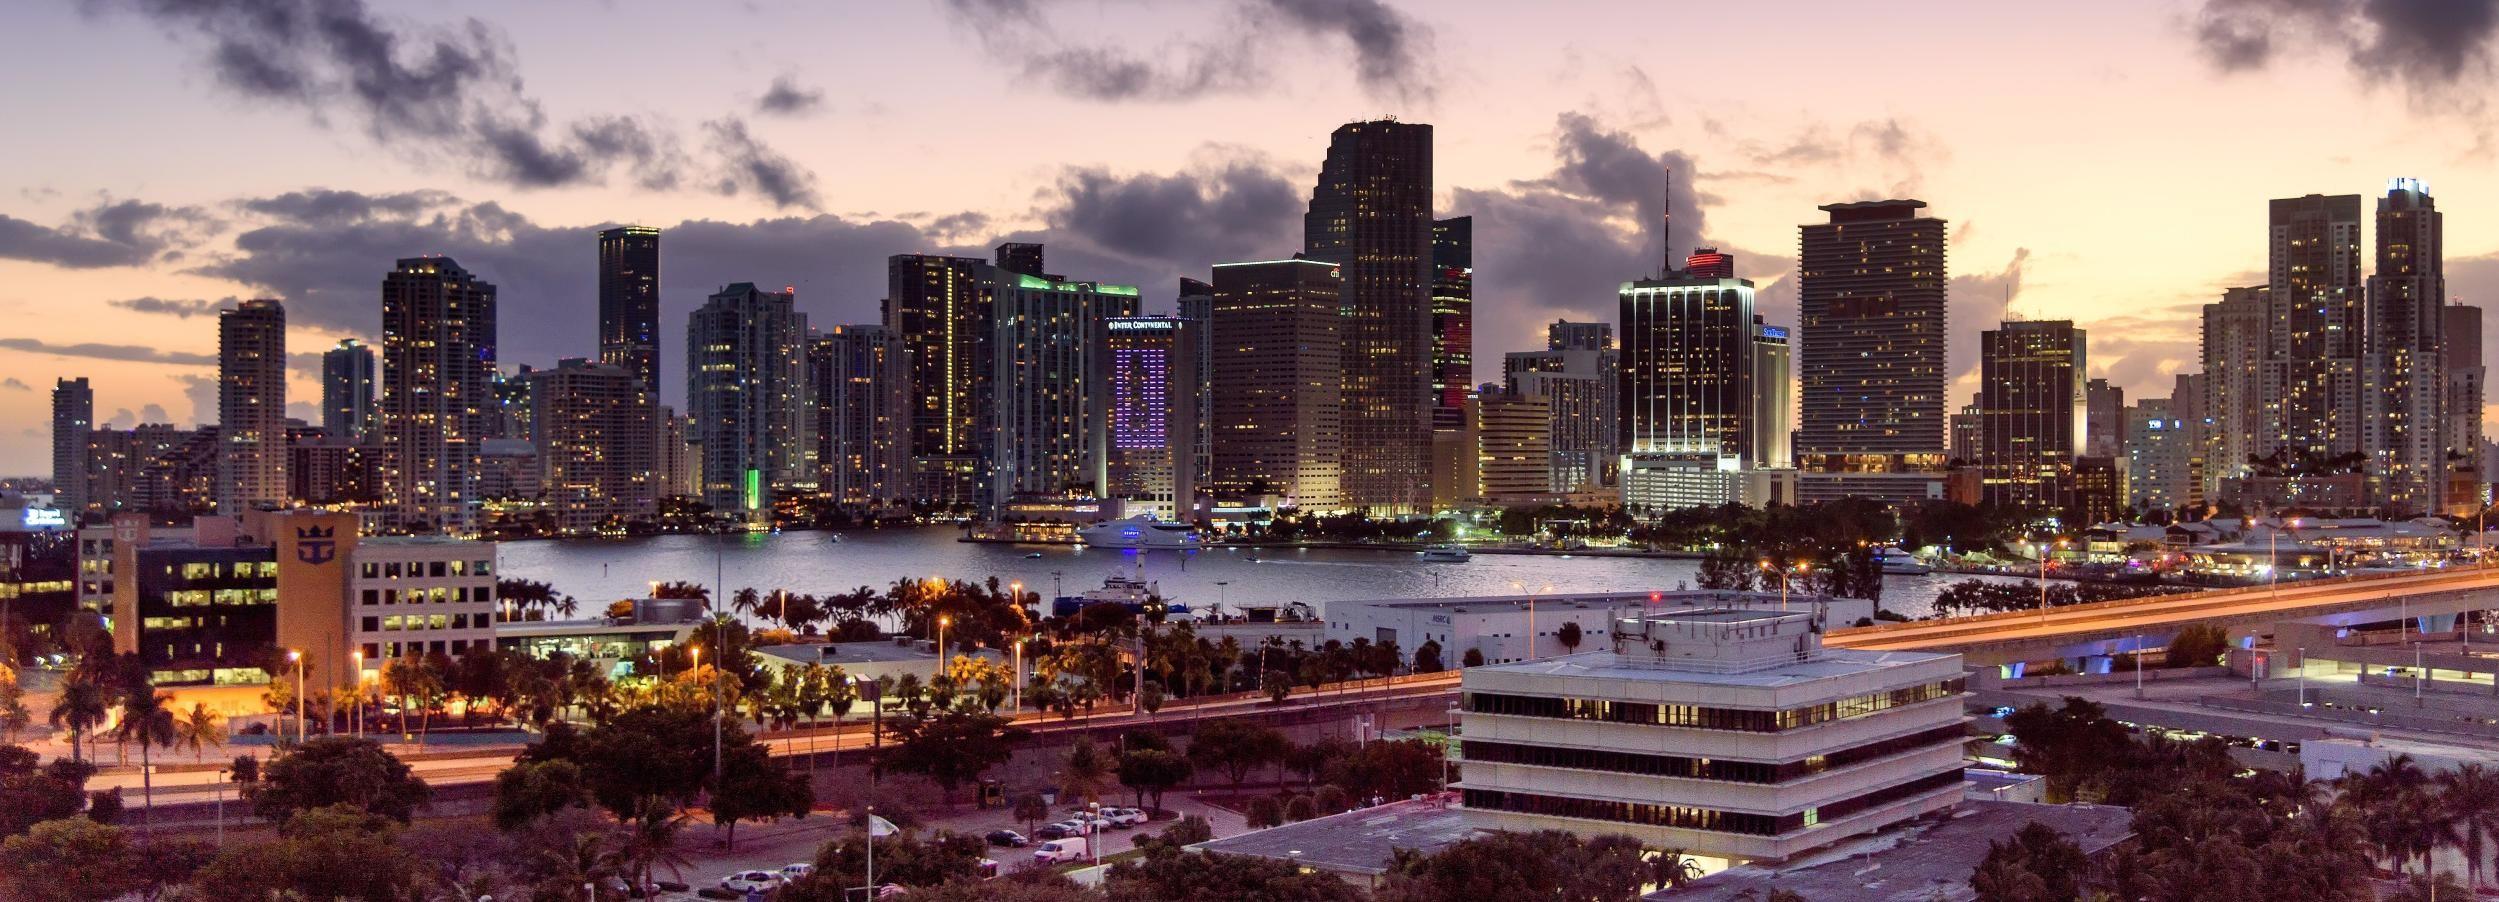 Miami: Romantische Flugzeugtour mit Champagner